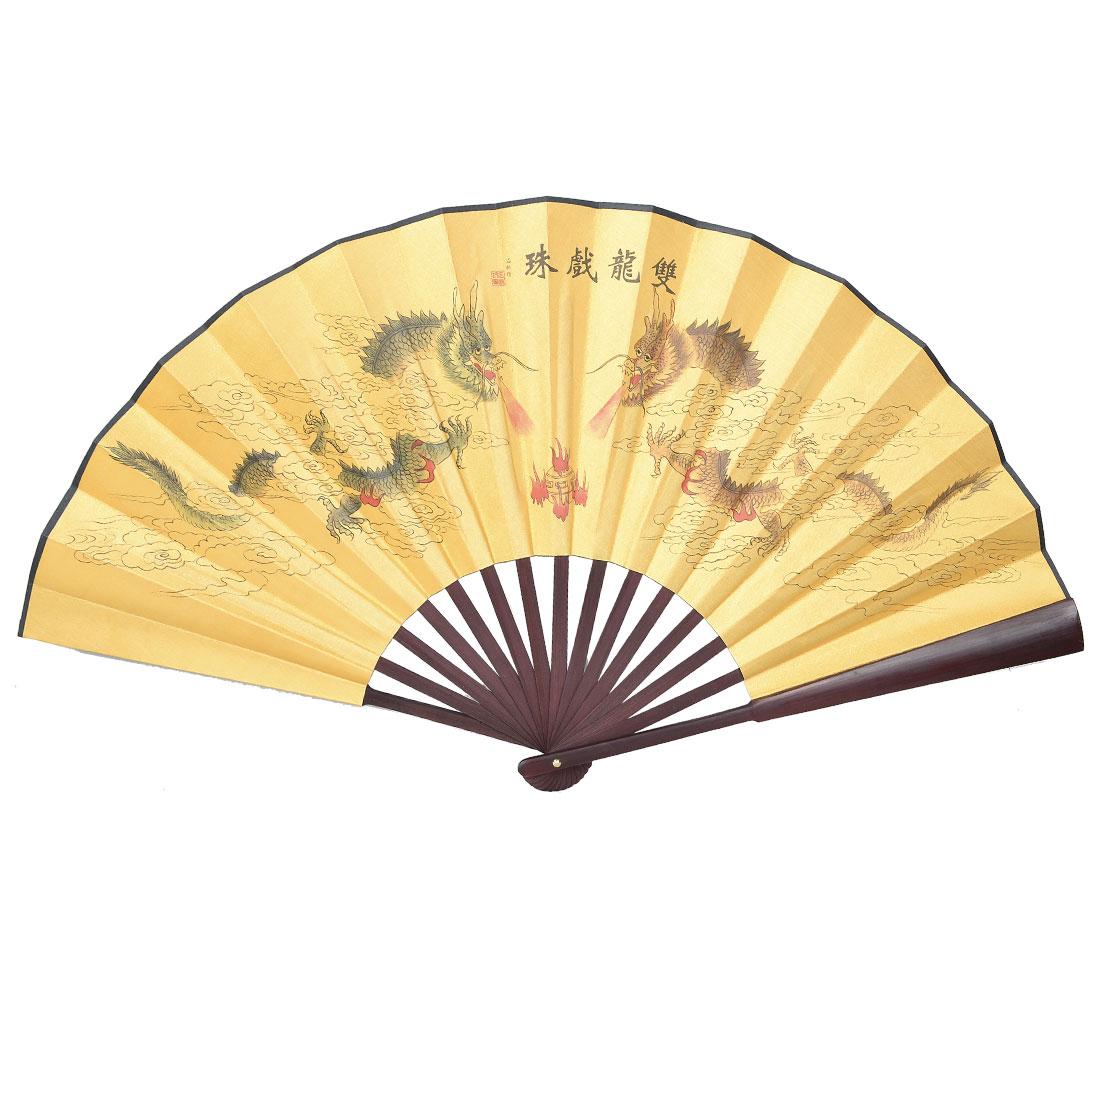 Dragon Poem Oriental Painting Rosewood Bamboo Ribs Folding Hand Fan